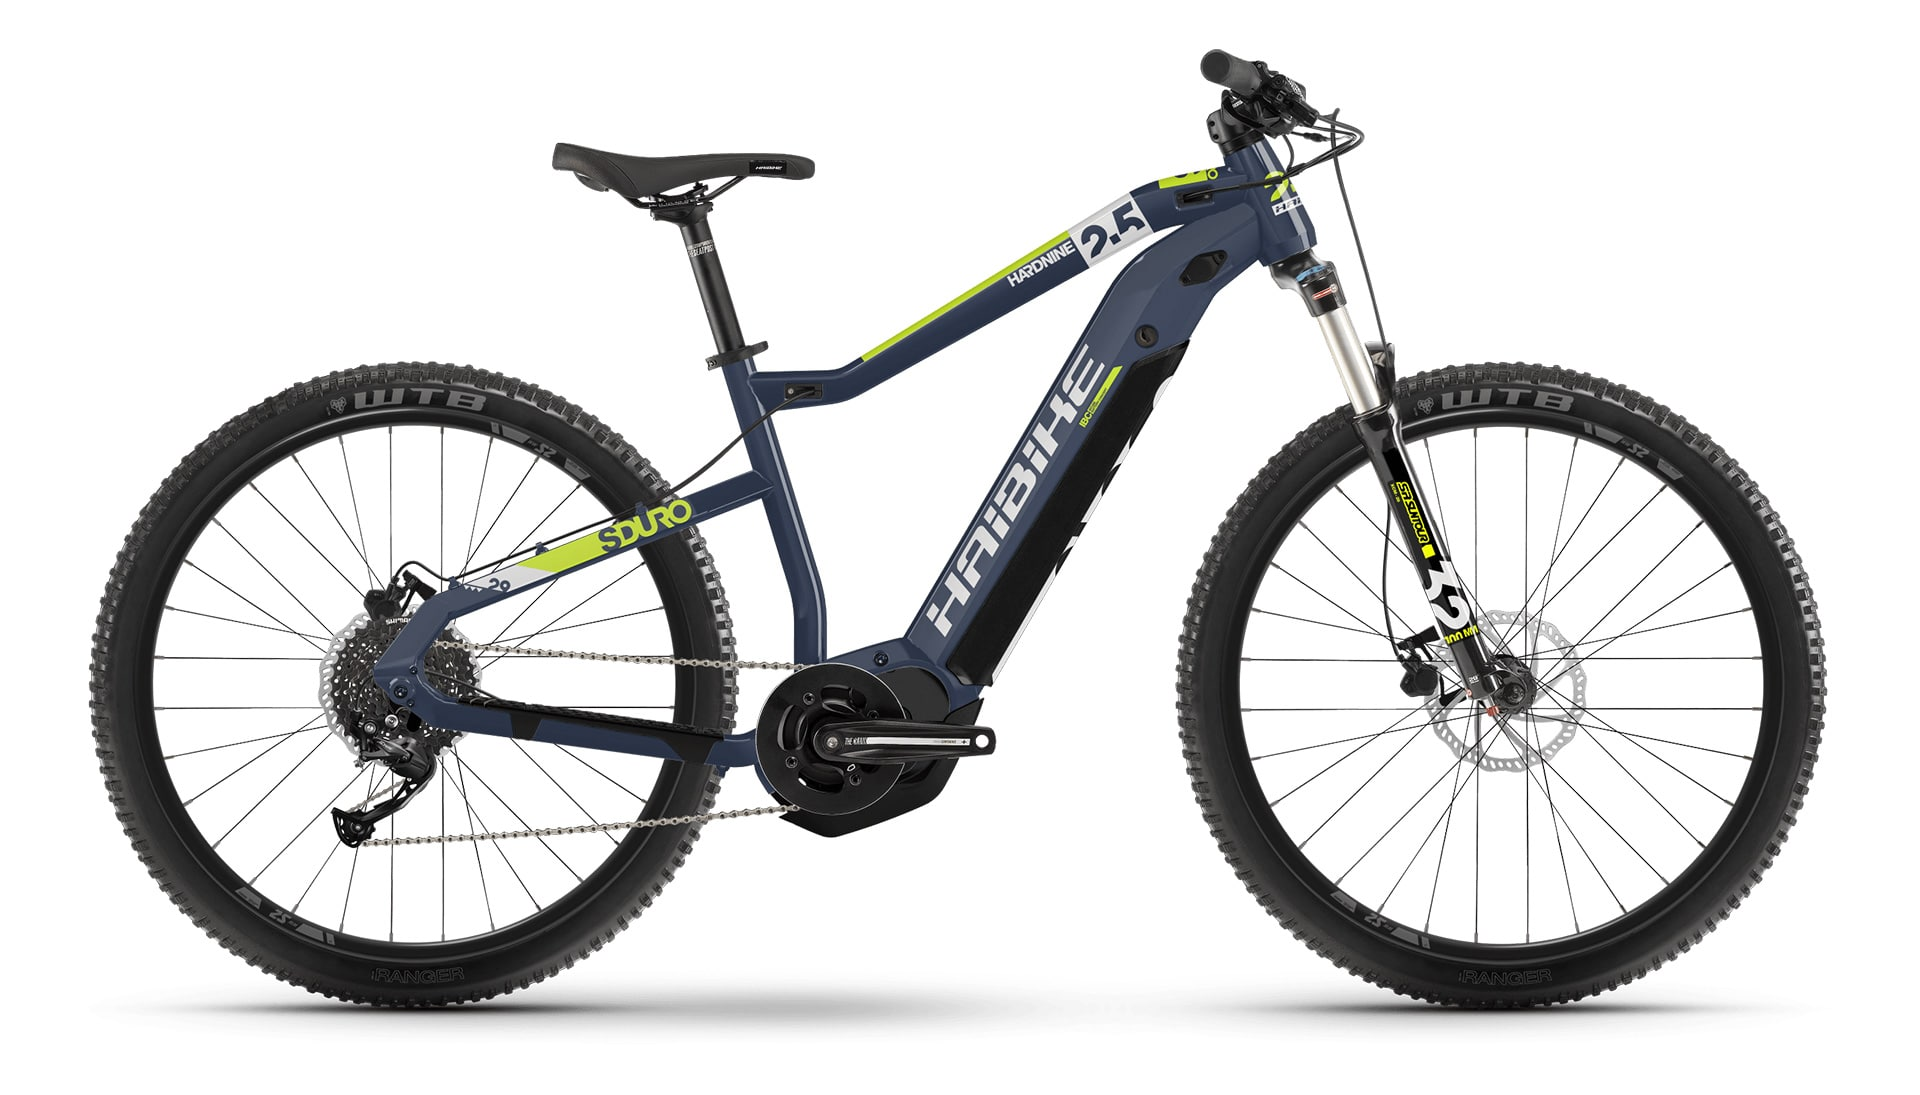 Haibike-hardnine_2.5-elektro_fahrrad-2021-01